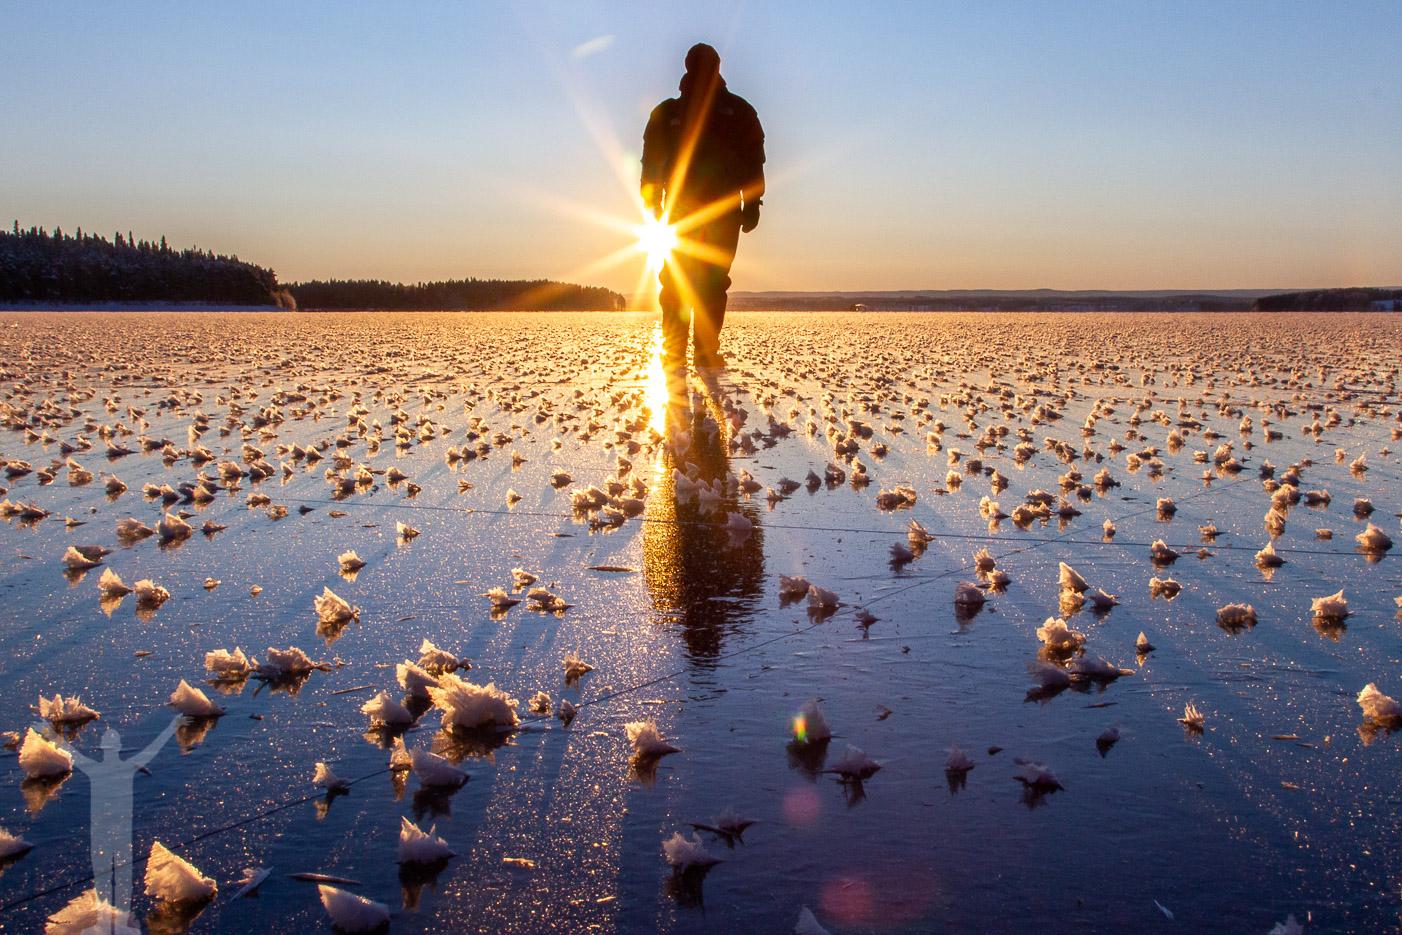 Maria i motljus på Storsjöns is